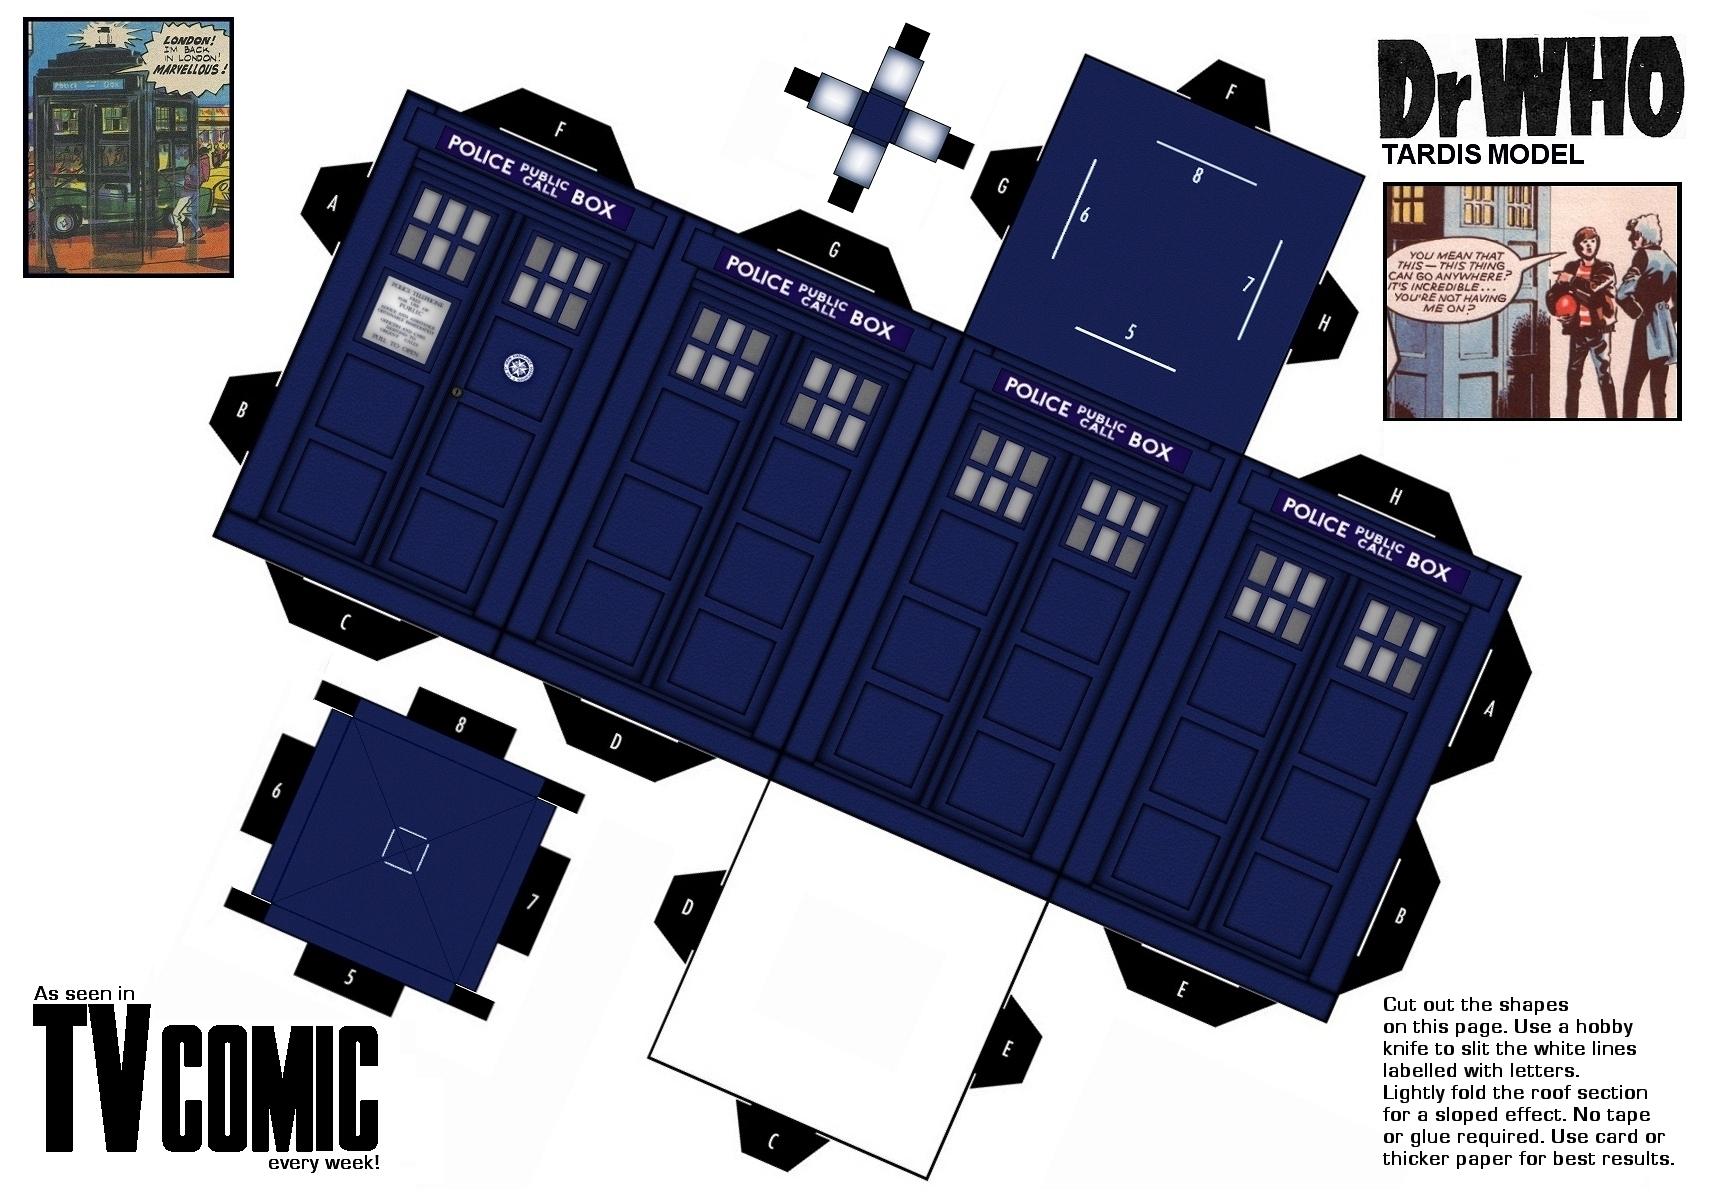 New TARDIS